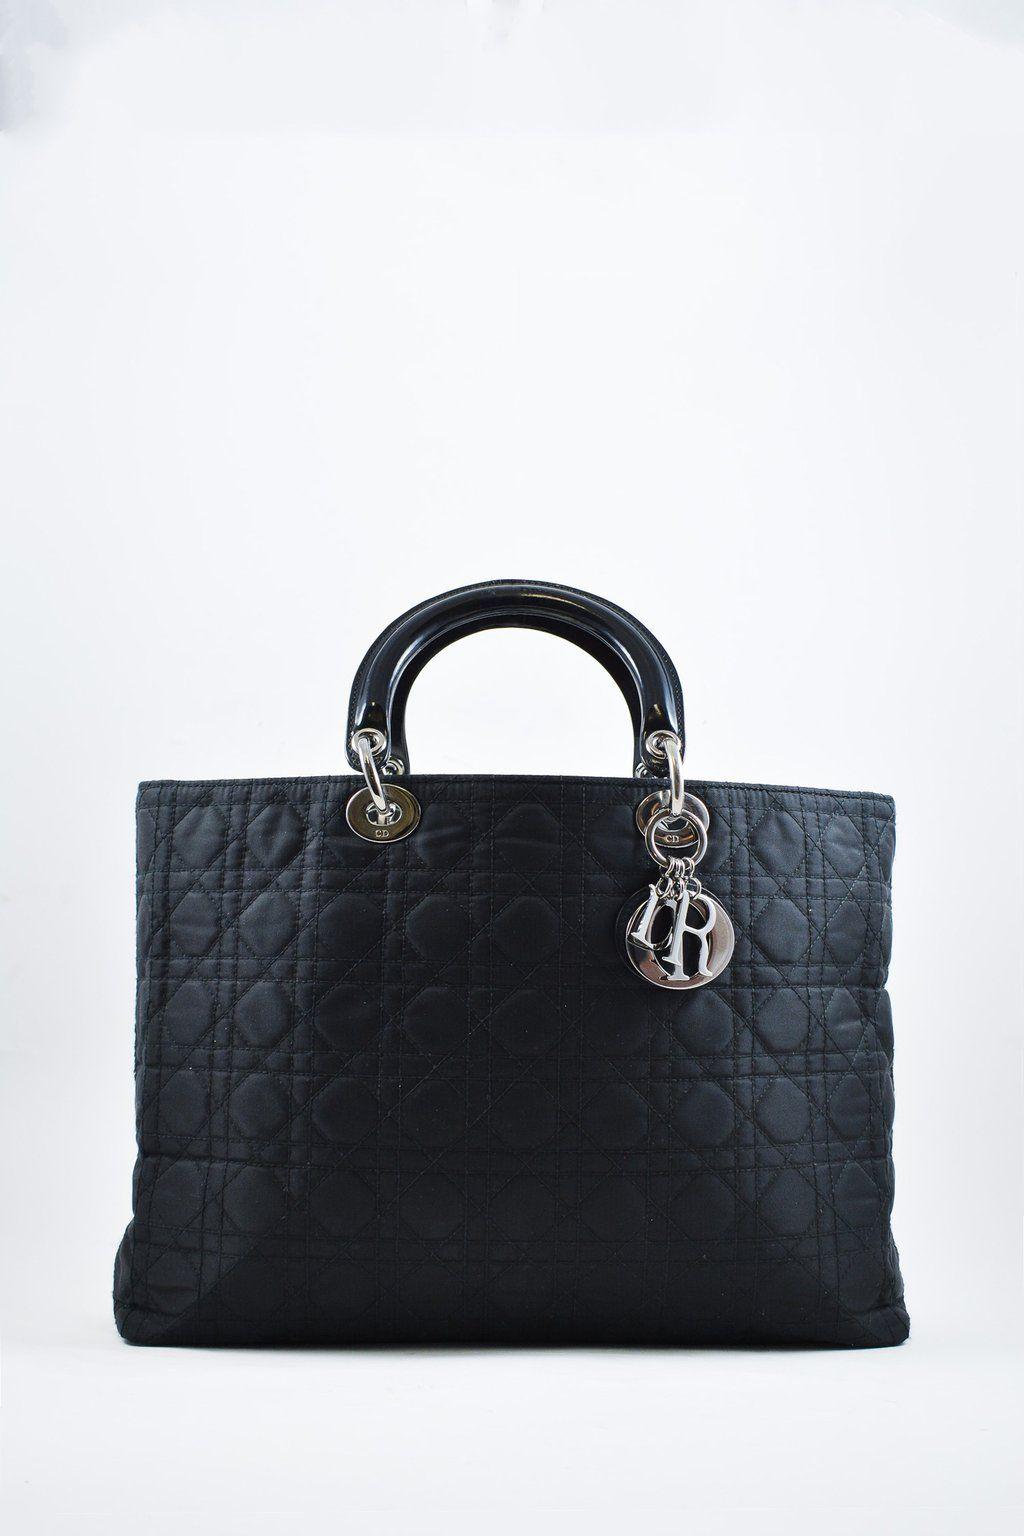 b14522245c5 Dior Large Black